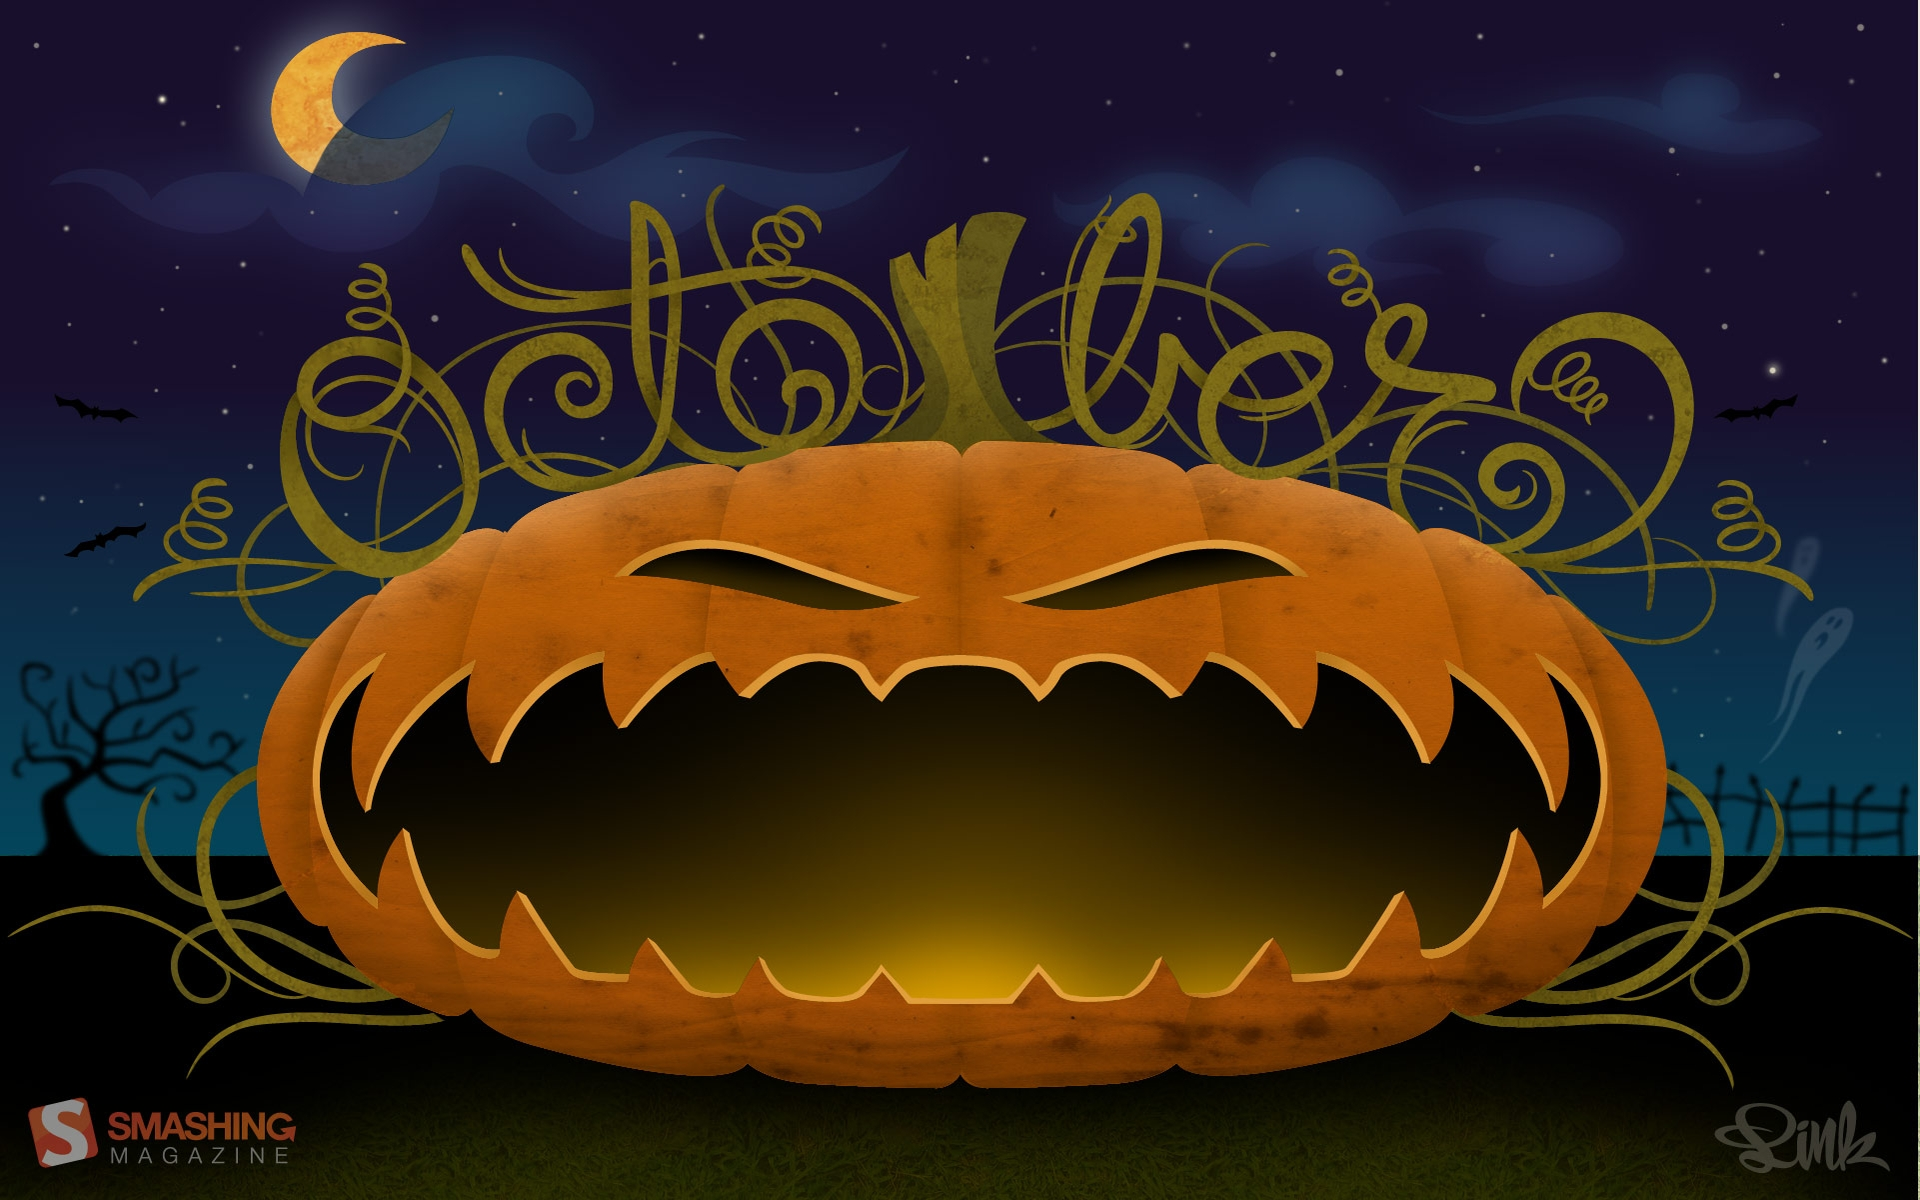 Halloween Desktop Wallpapers FREE on Latorocom 1920x1200